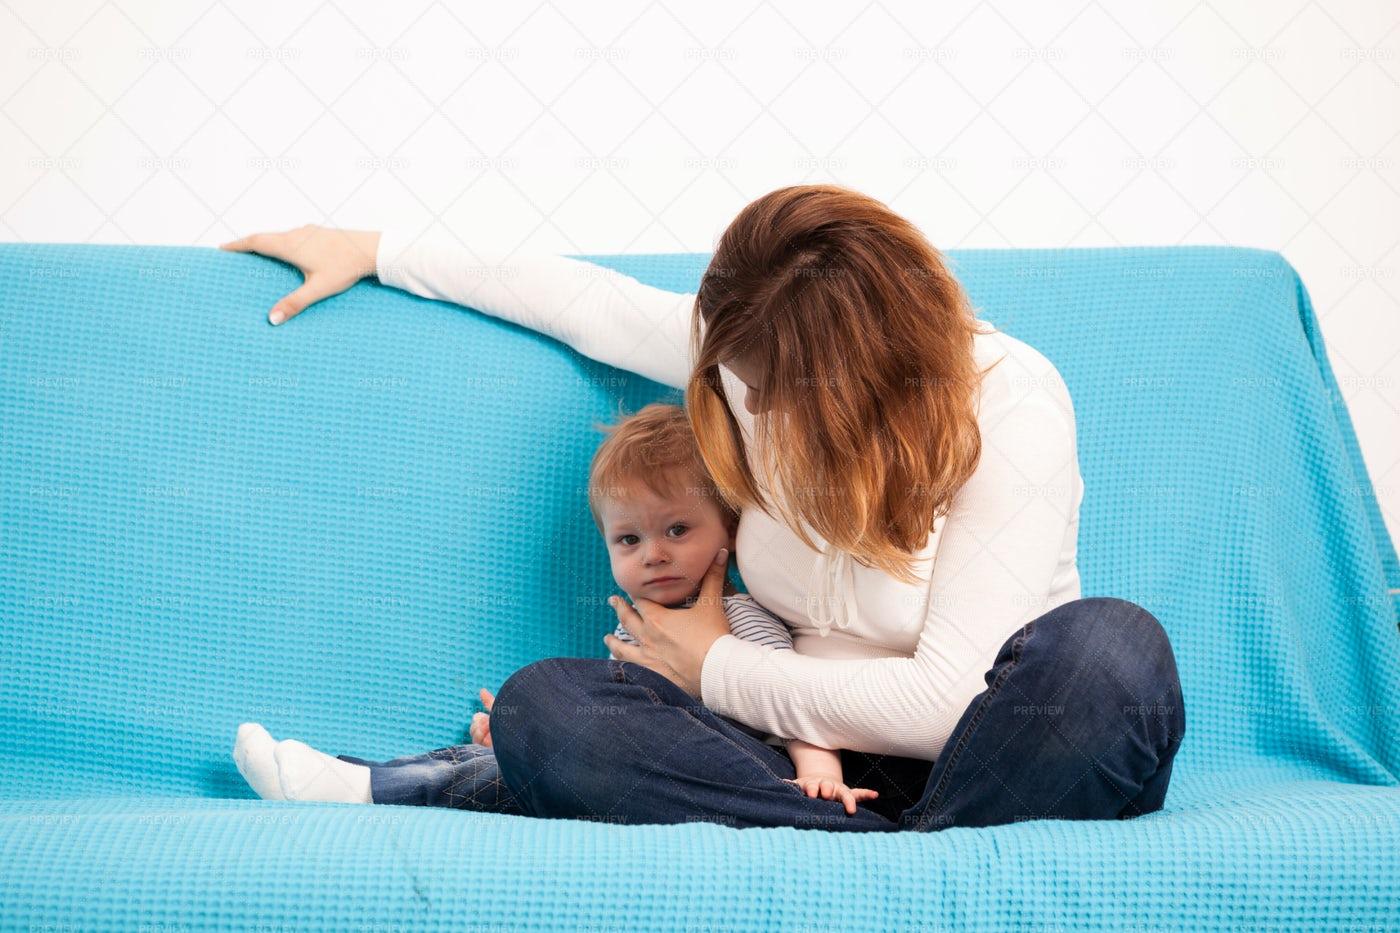 Mother Checking On Toddler: Stock Photos